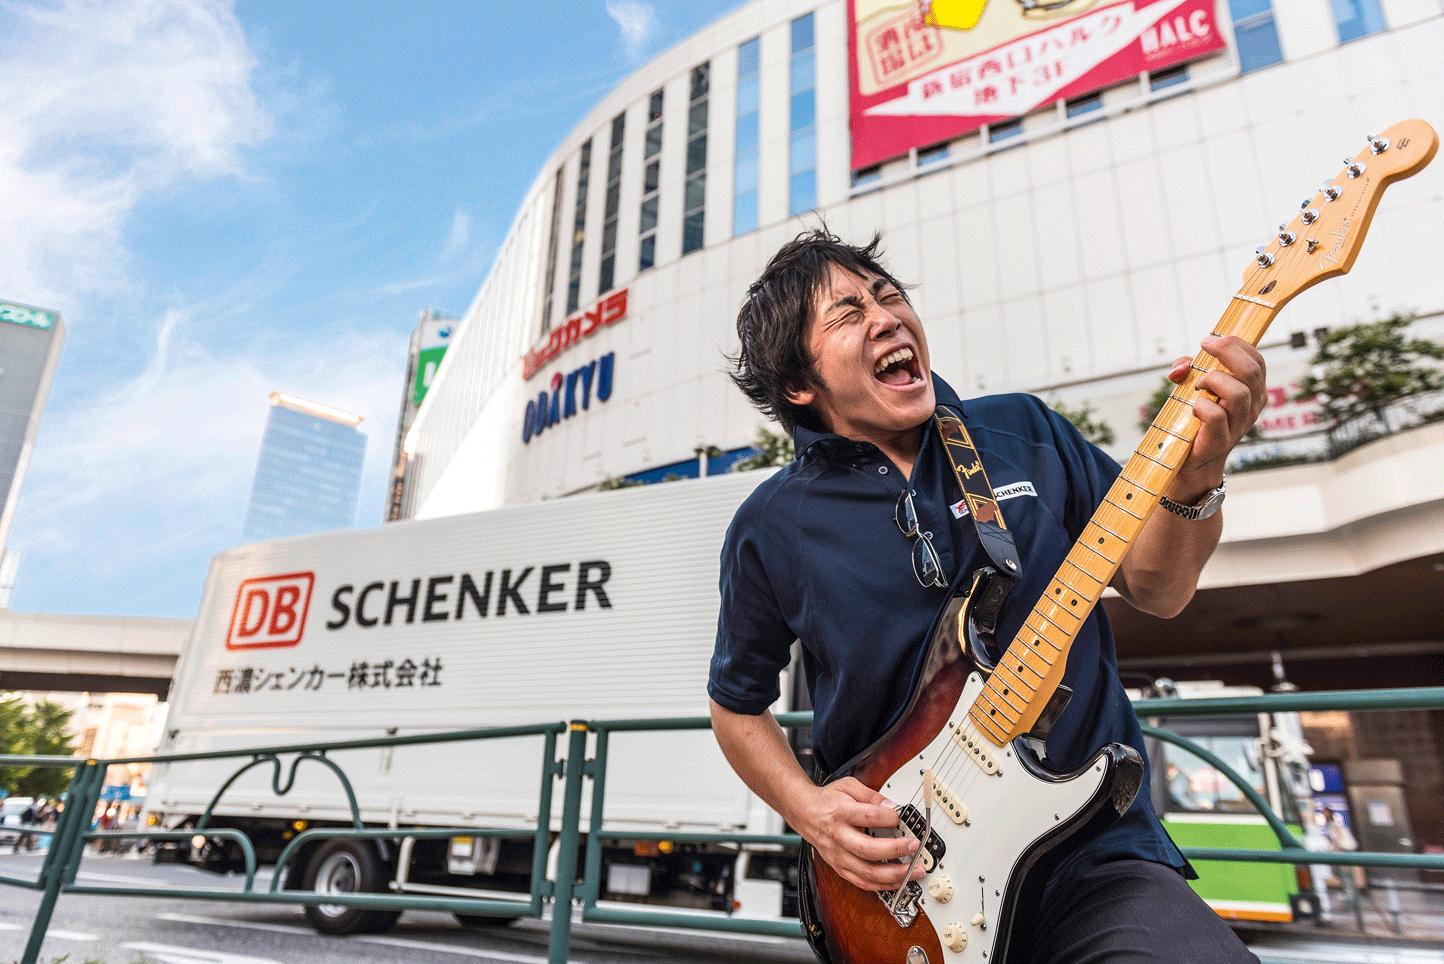 fender_guitar_man